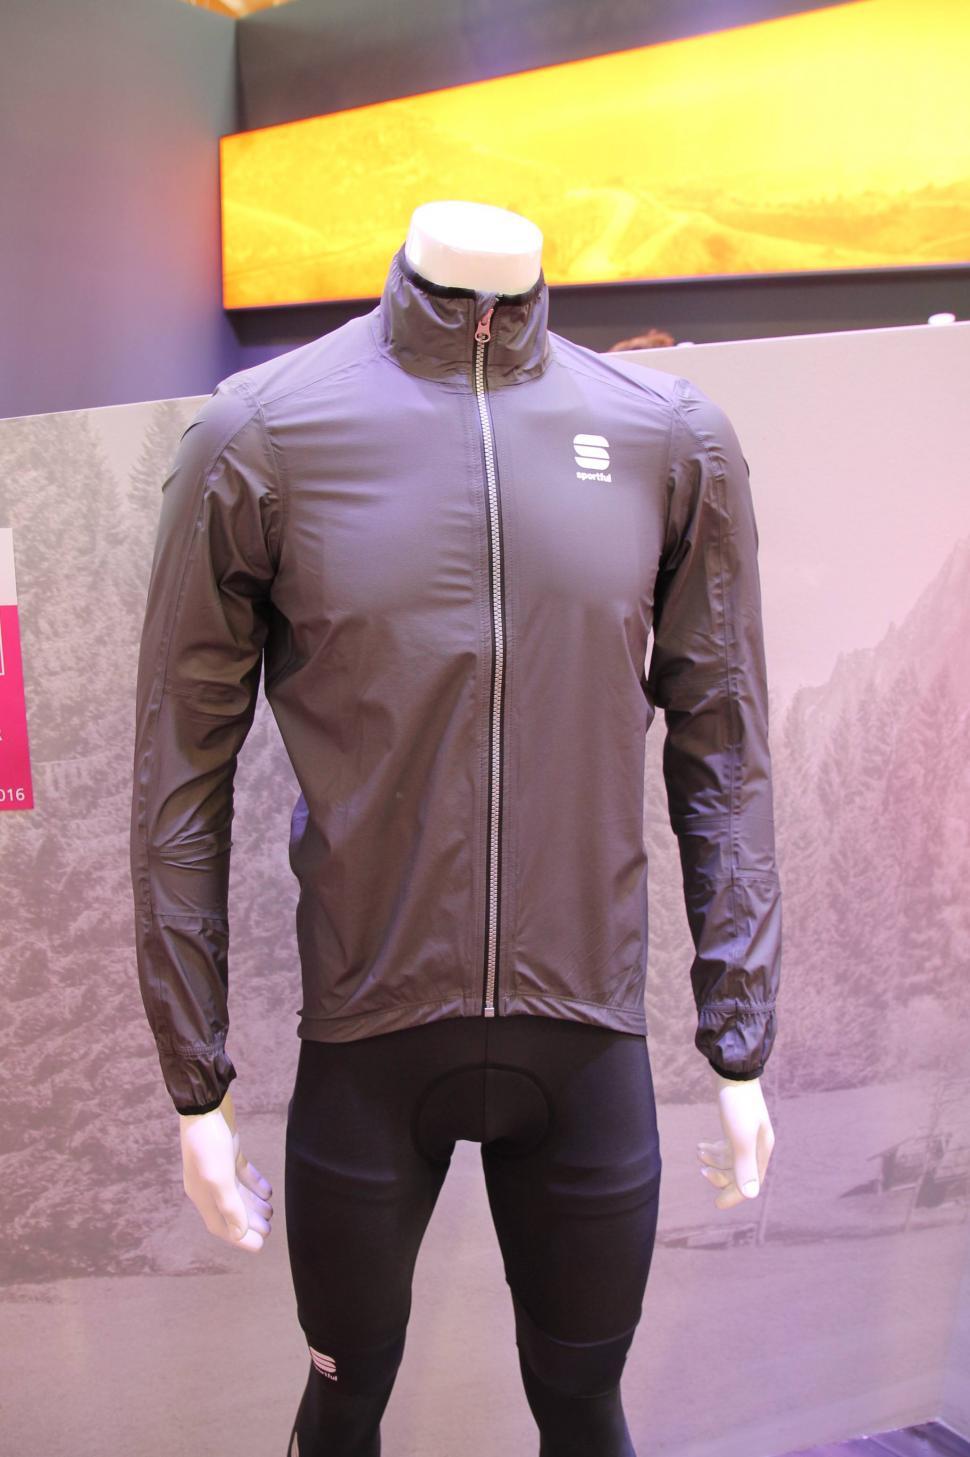 Sportful 2017 clothing - 15.jpg